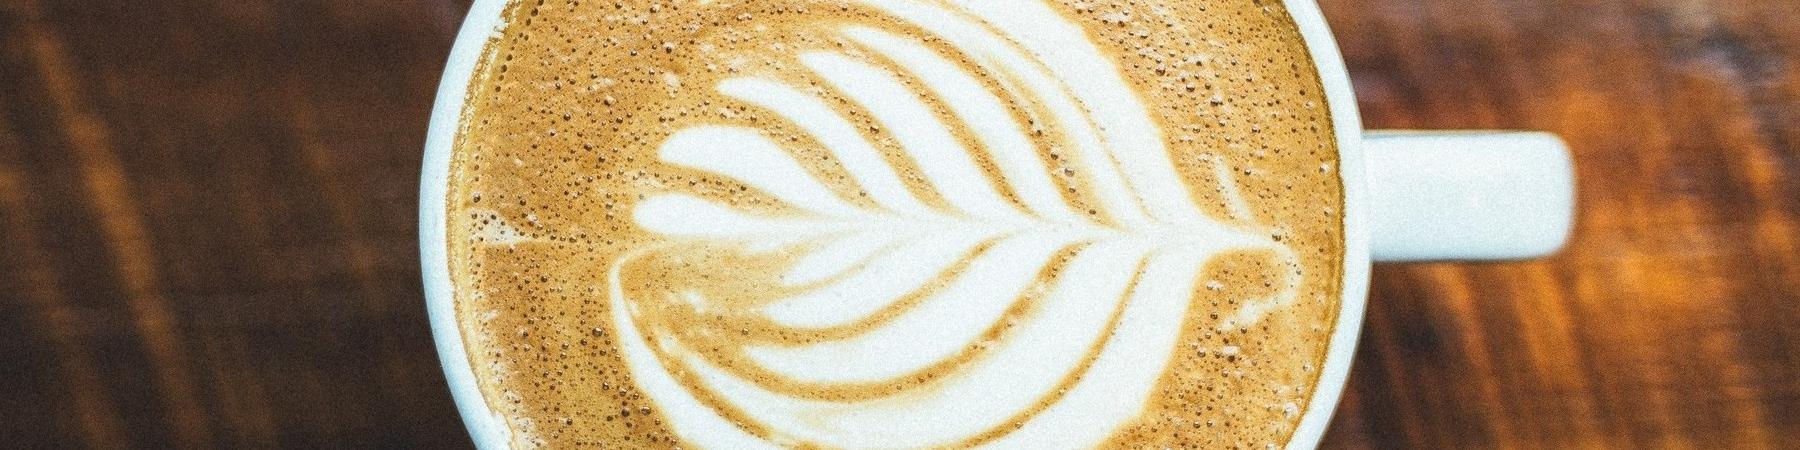 Junge Beratung Berlin Kaffee